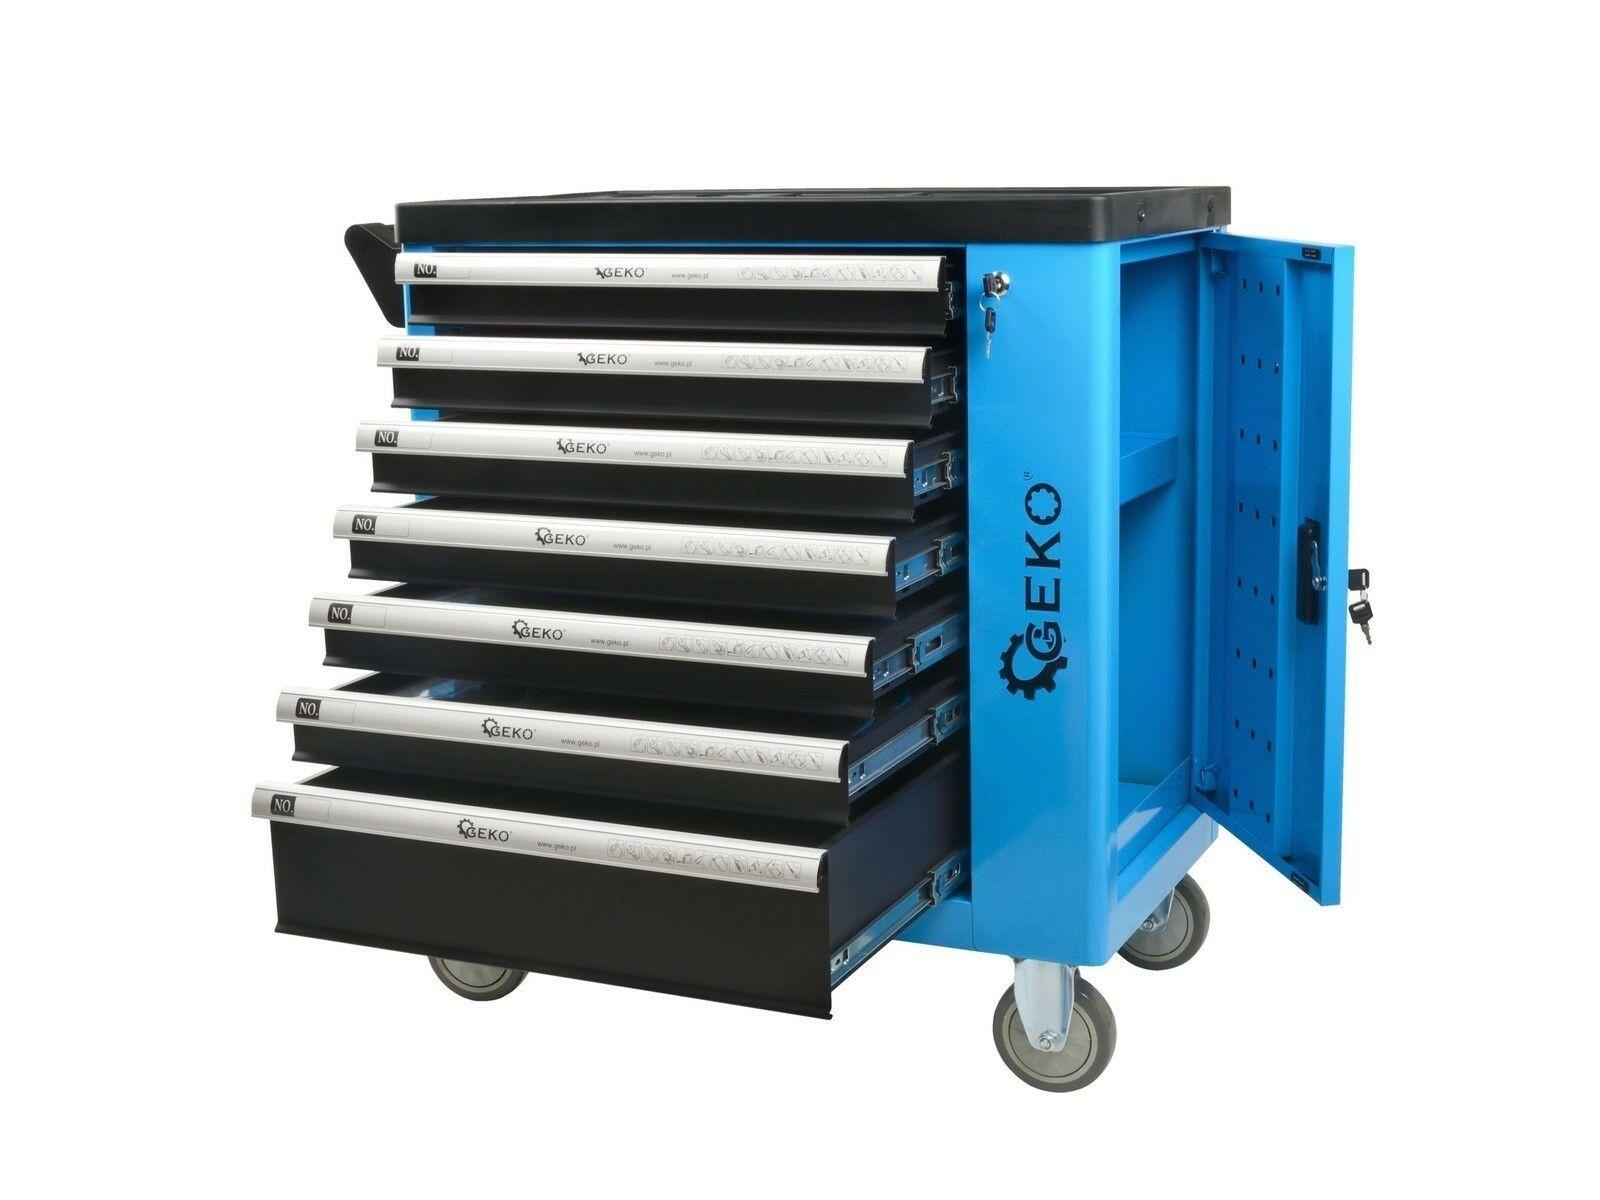 Dílenská skříňka/vozík s výbavou 243ks 7 zásuvek GEKO